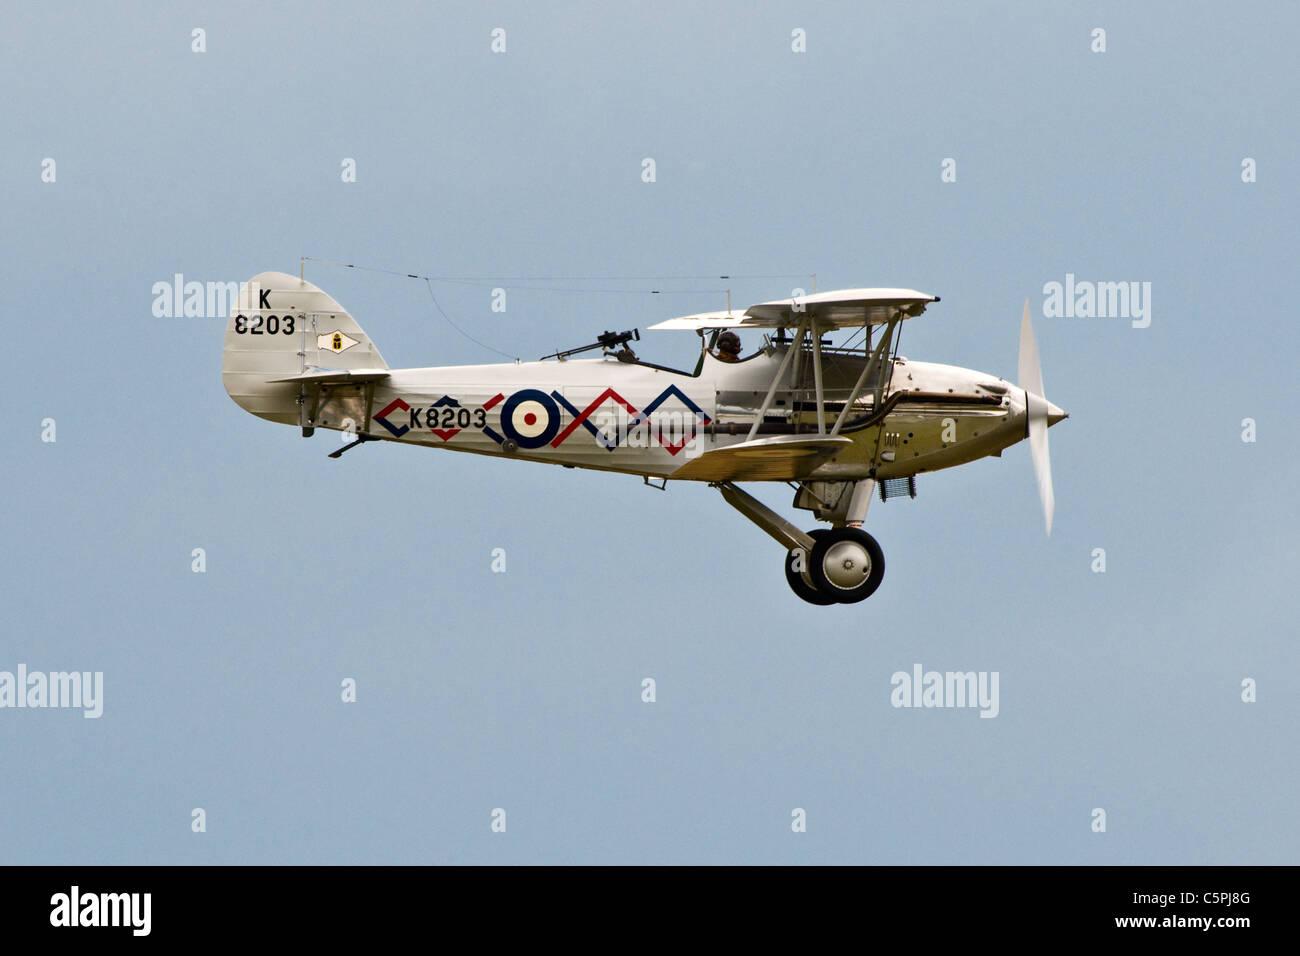 Vintage aircraft Demon two seater bi-plane - Stock Image